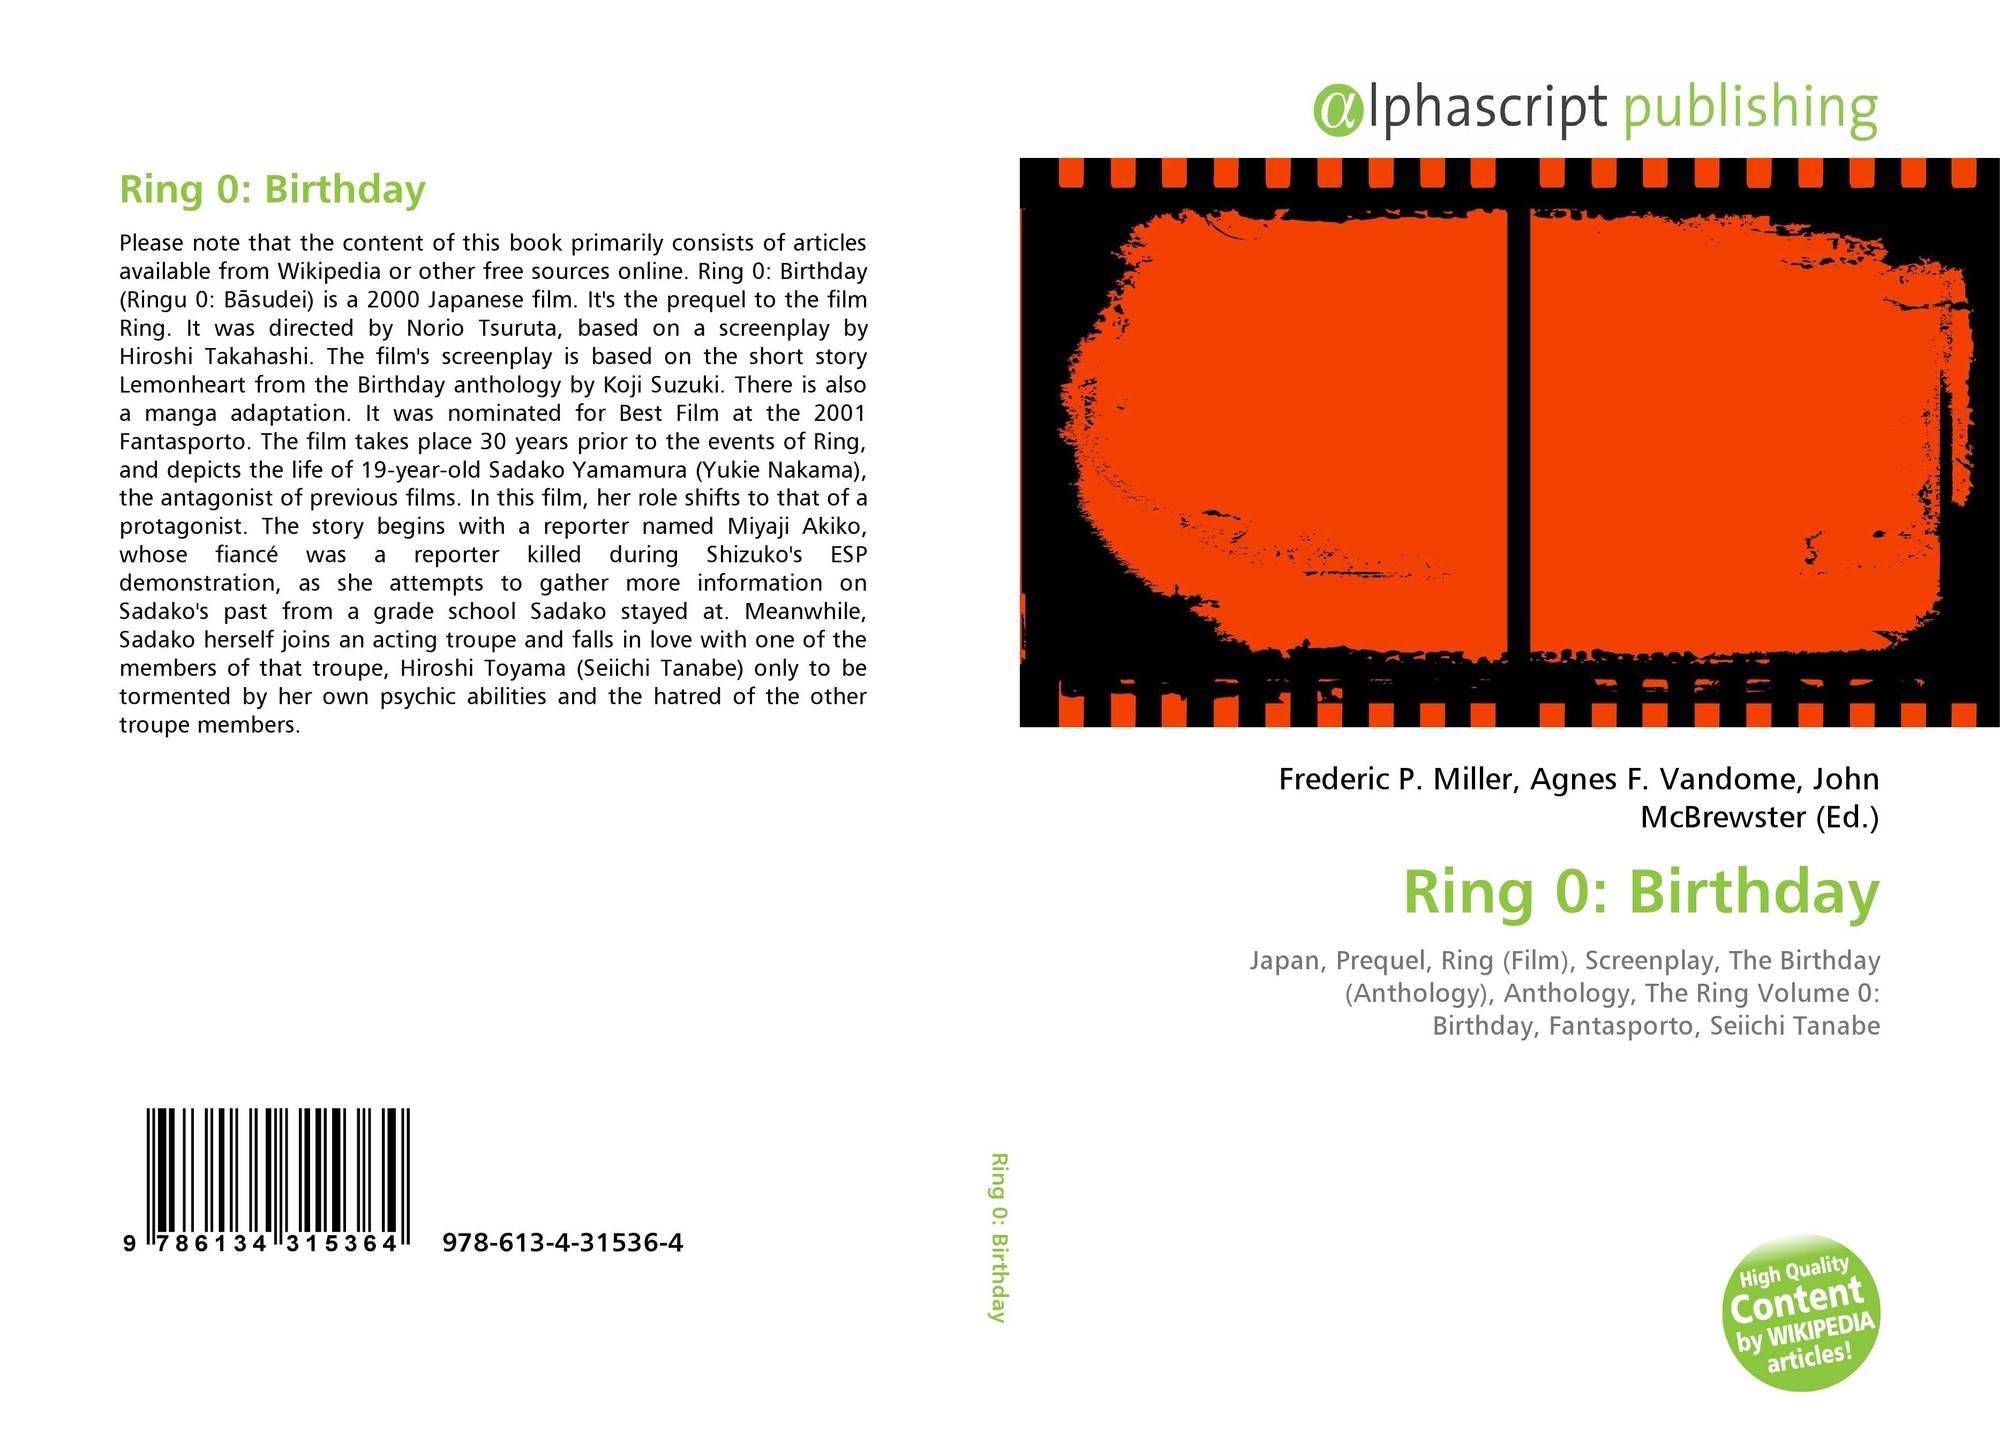 Ring 0: Birthday, 978-613-4-31536-4, 6134315362 ,9786134315364